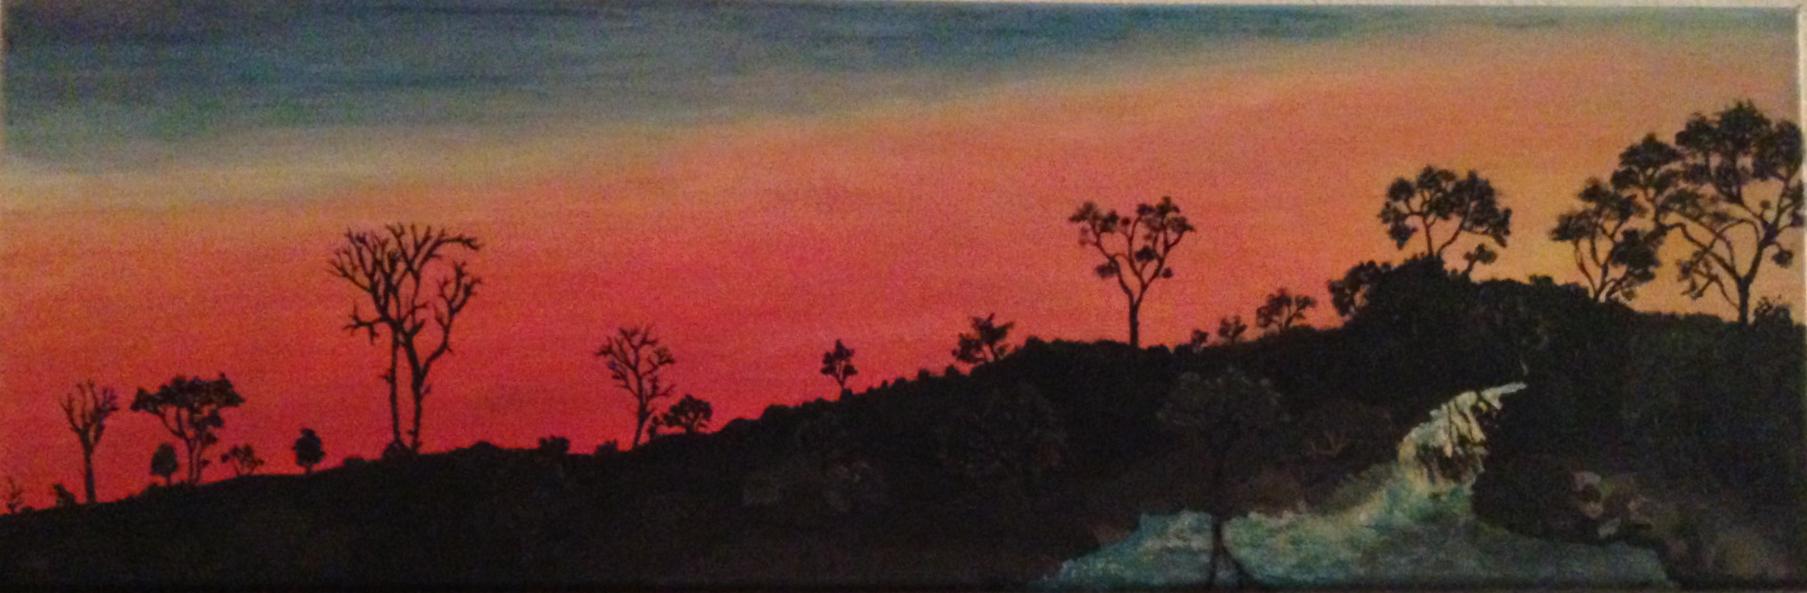 Africa Setting sun